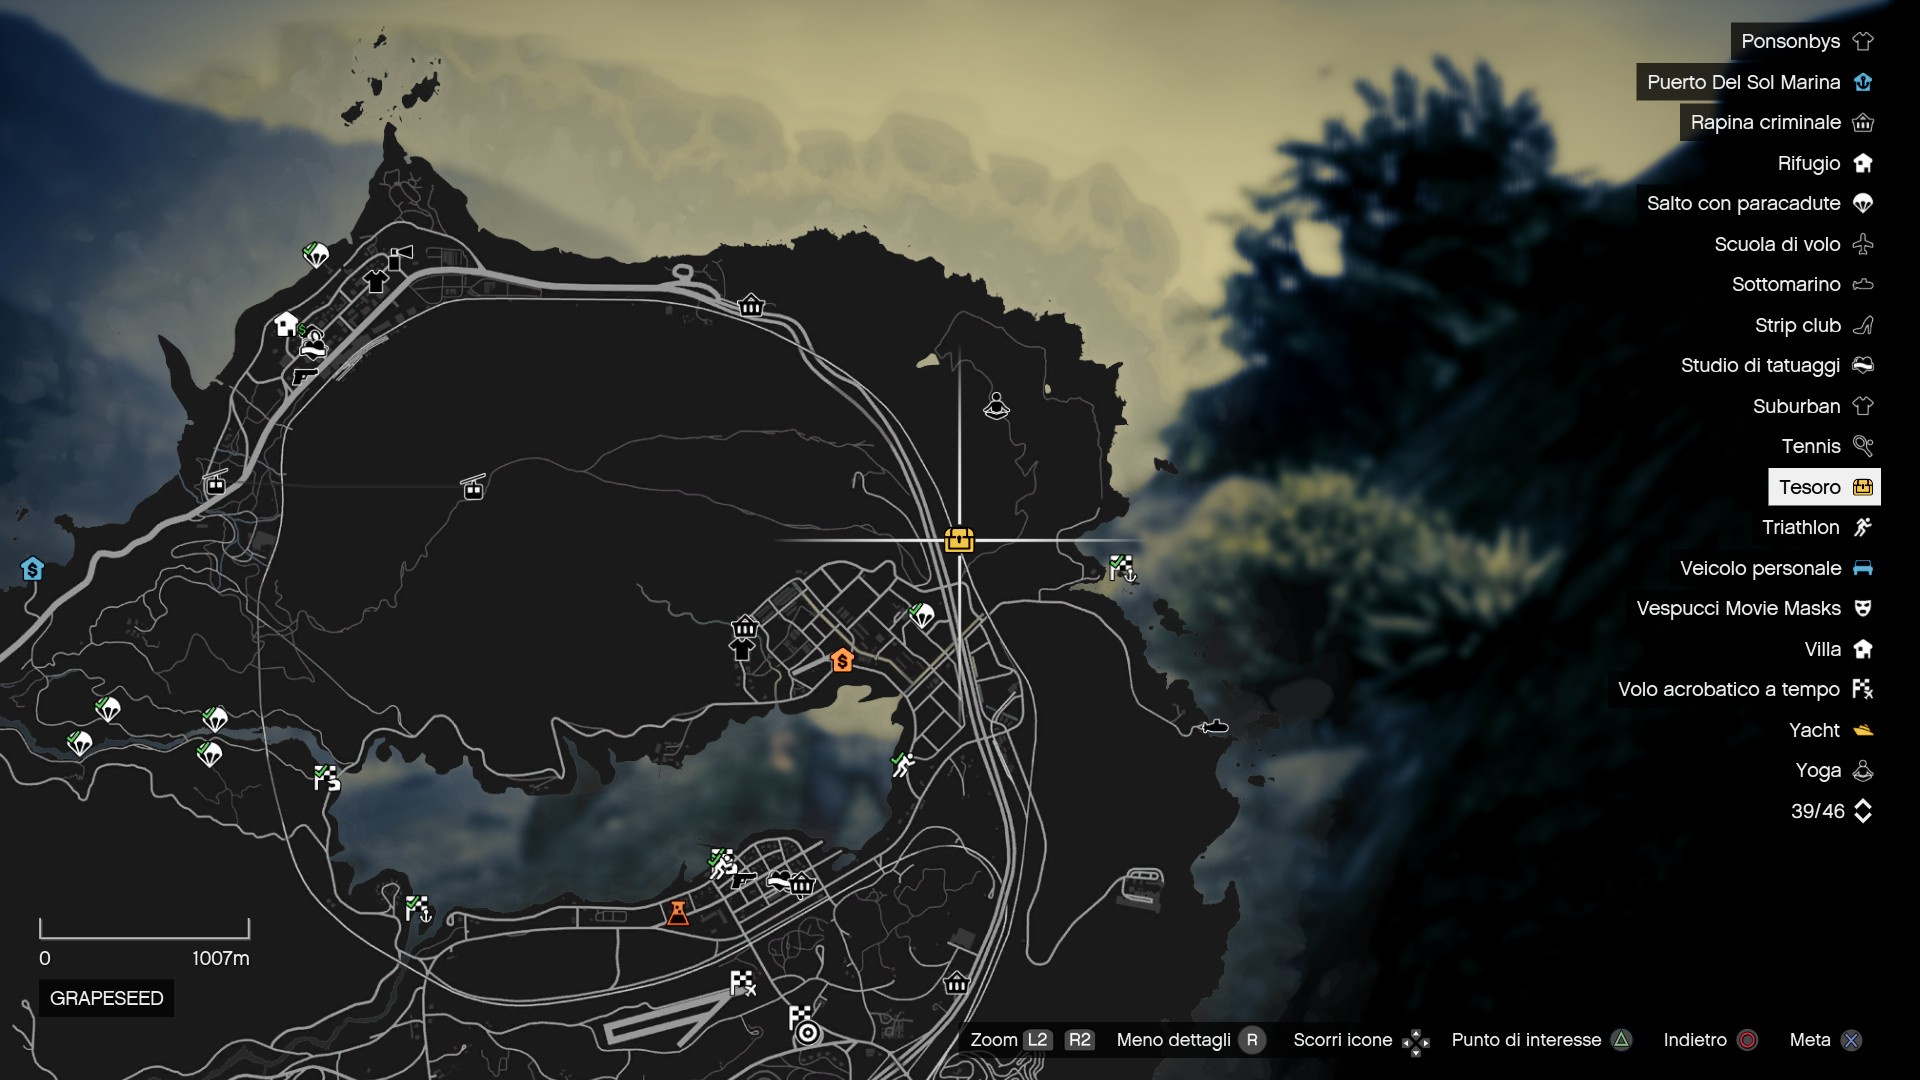 treasure hunt gta gta5 maps mods downloads